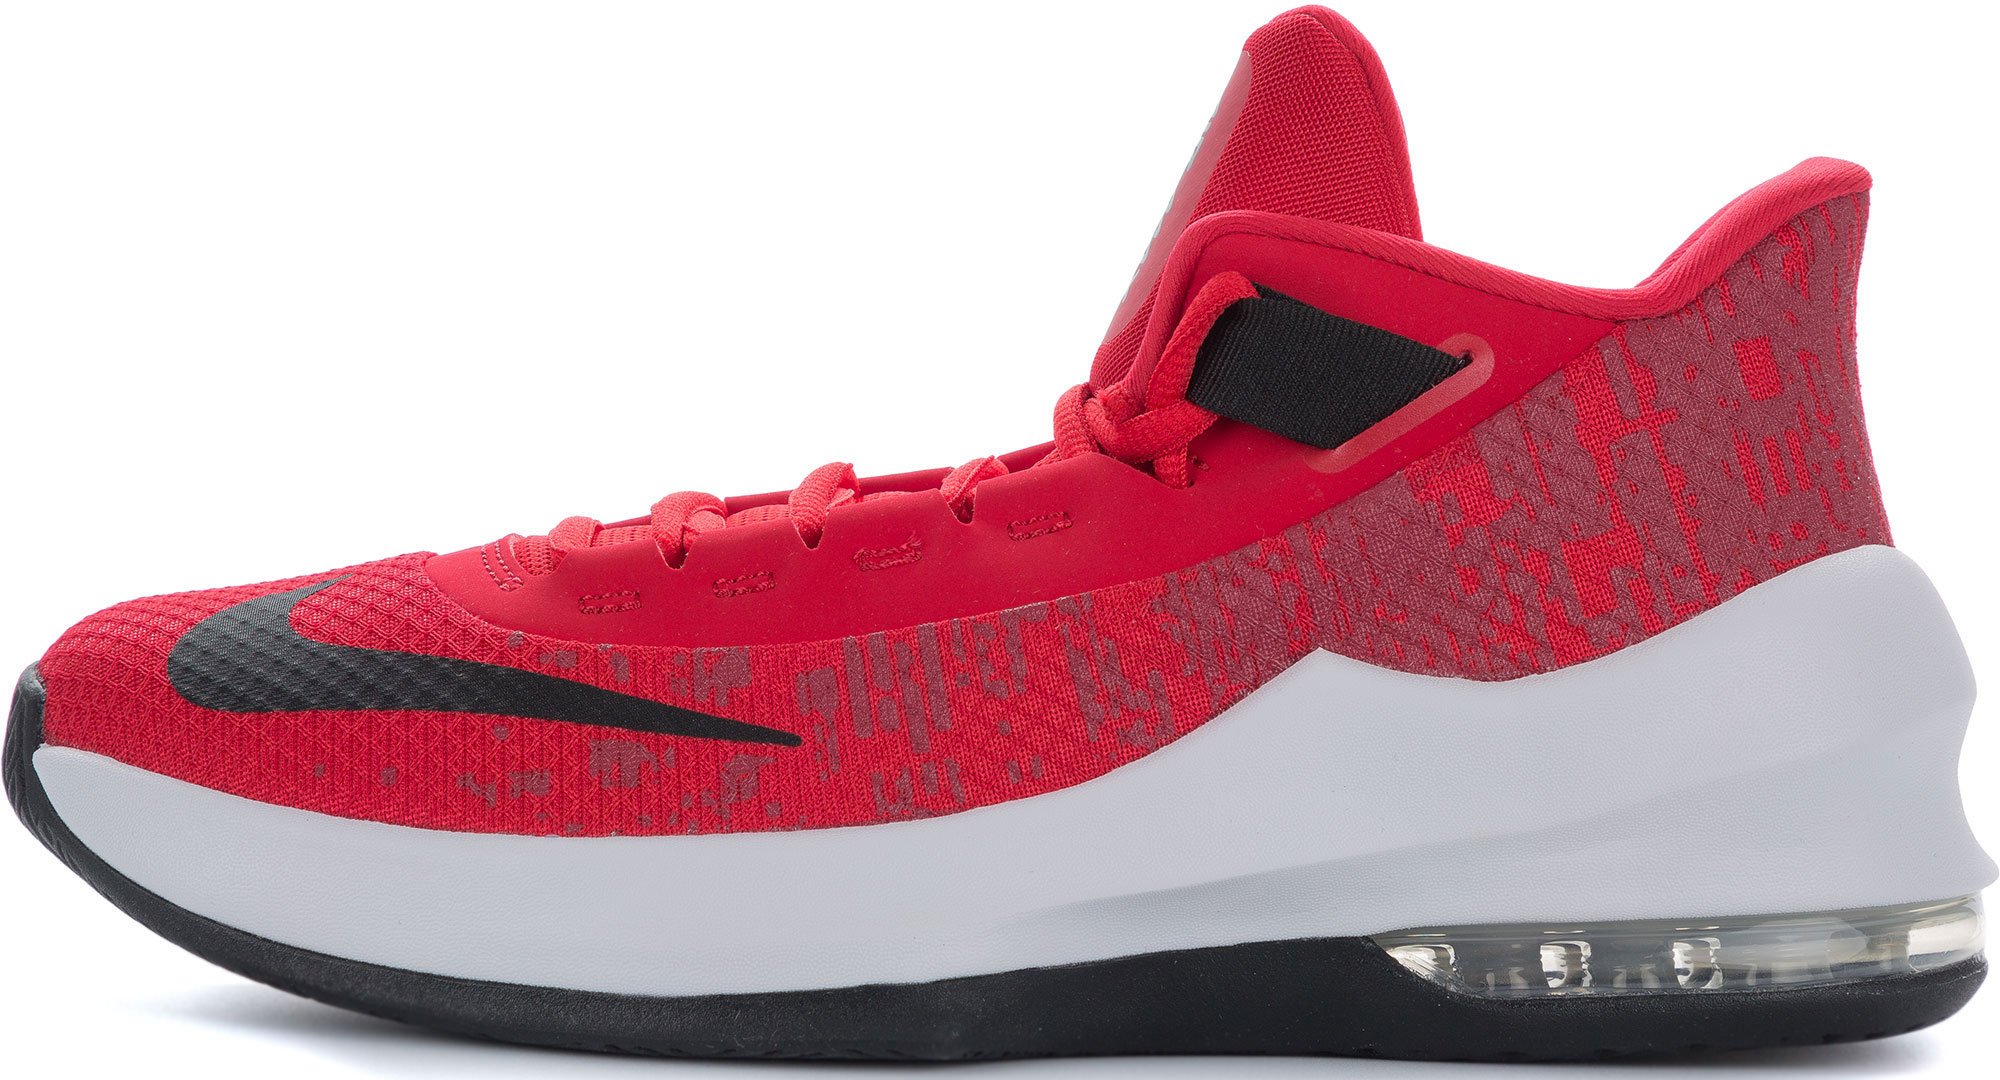 Nike Кроссовки для девочек Nike Air Max Infuriate 2, размер 39 цены онлайн